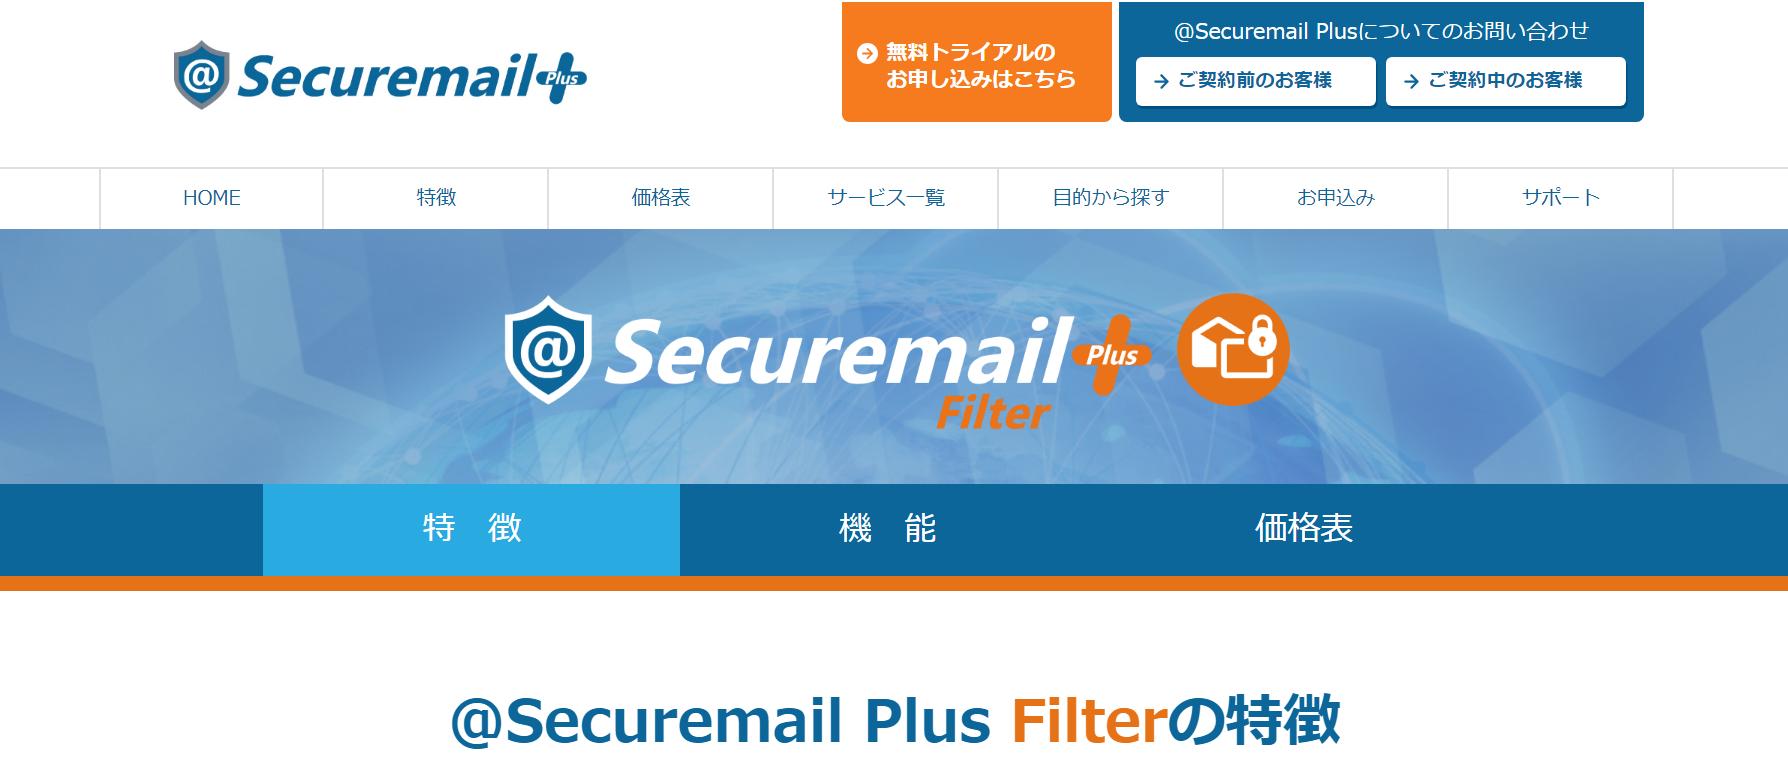 @Securemail Plus Filter